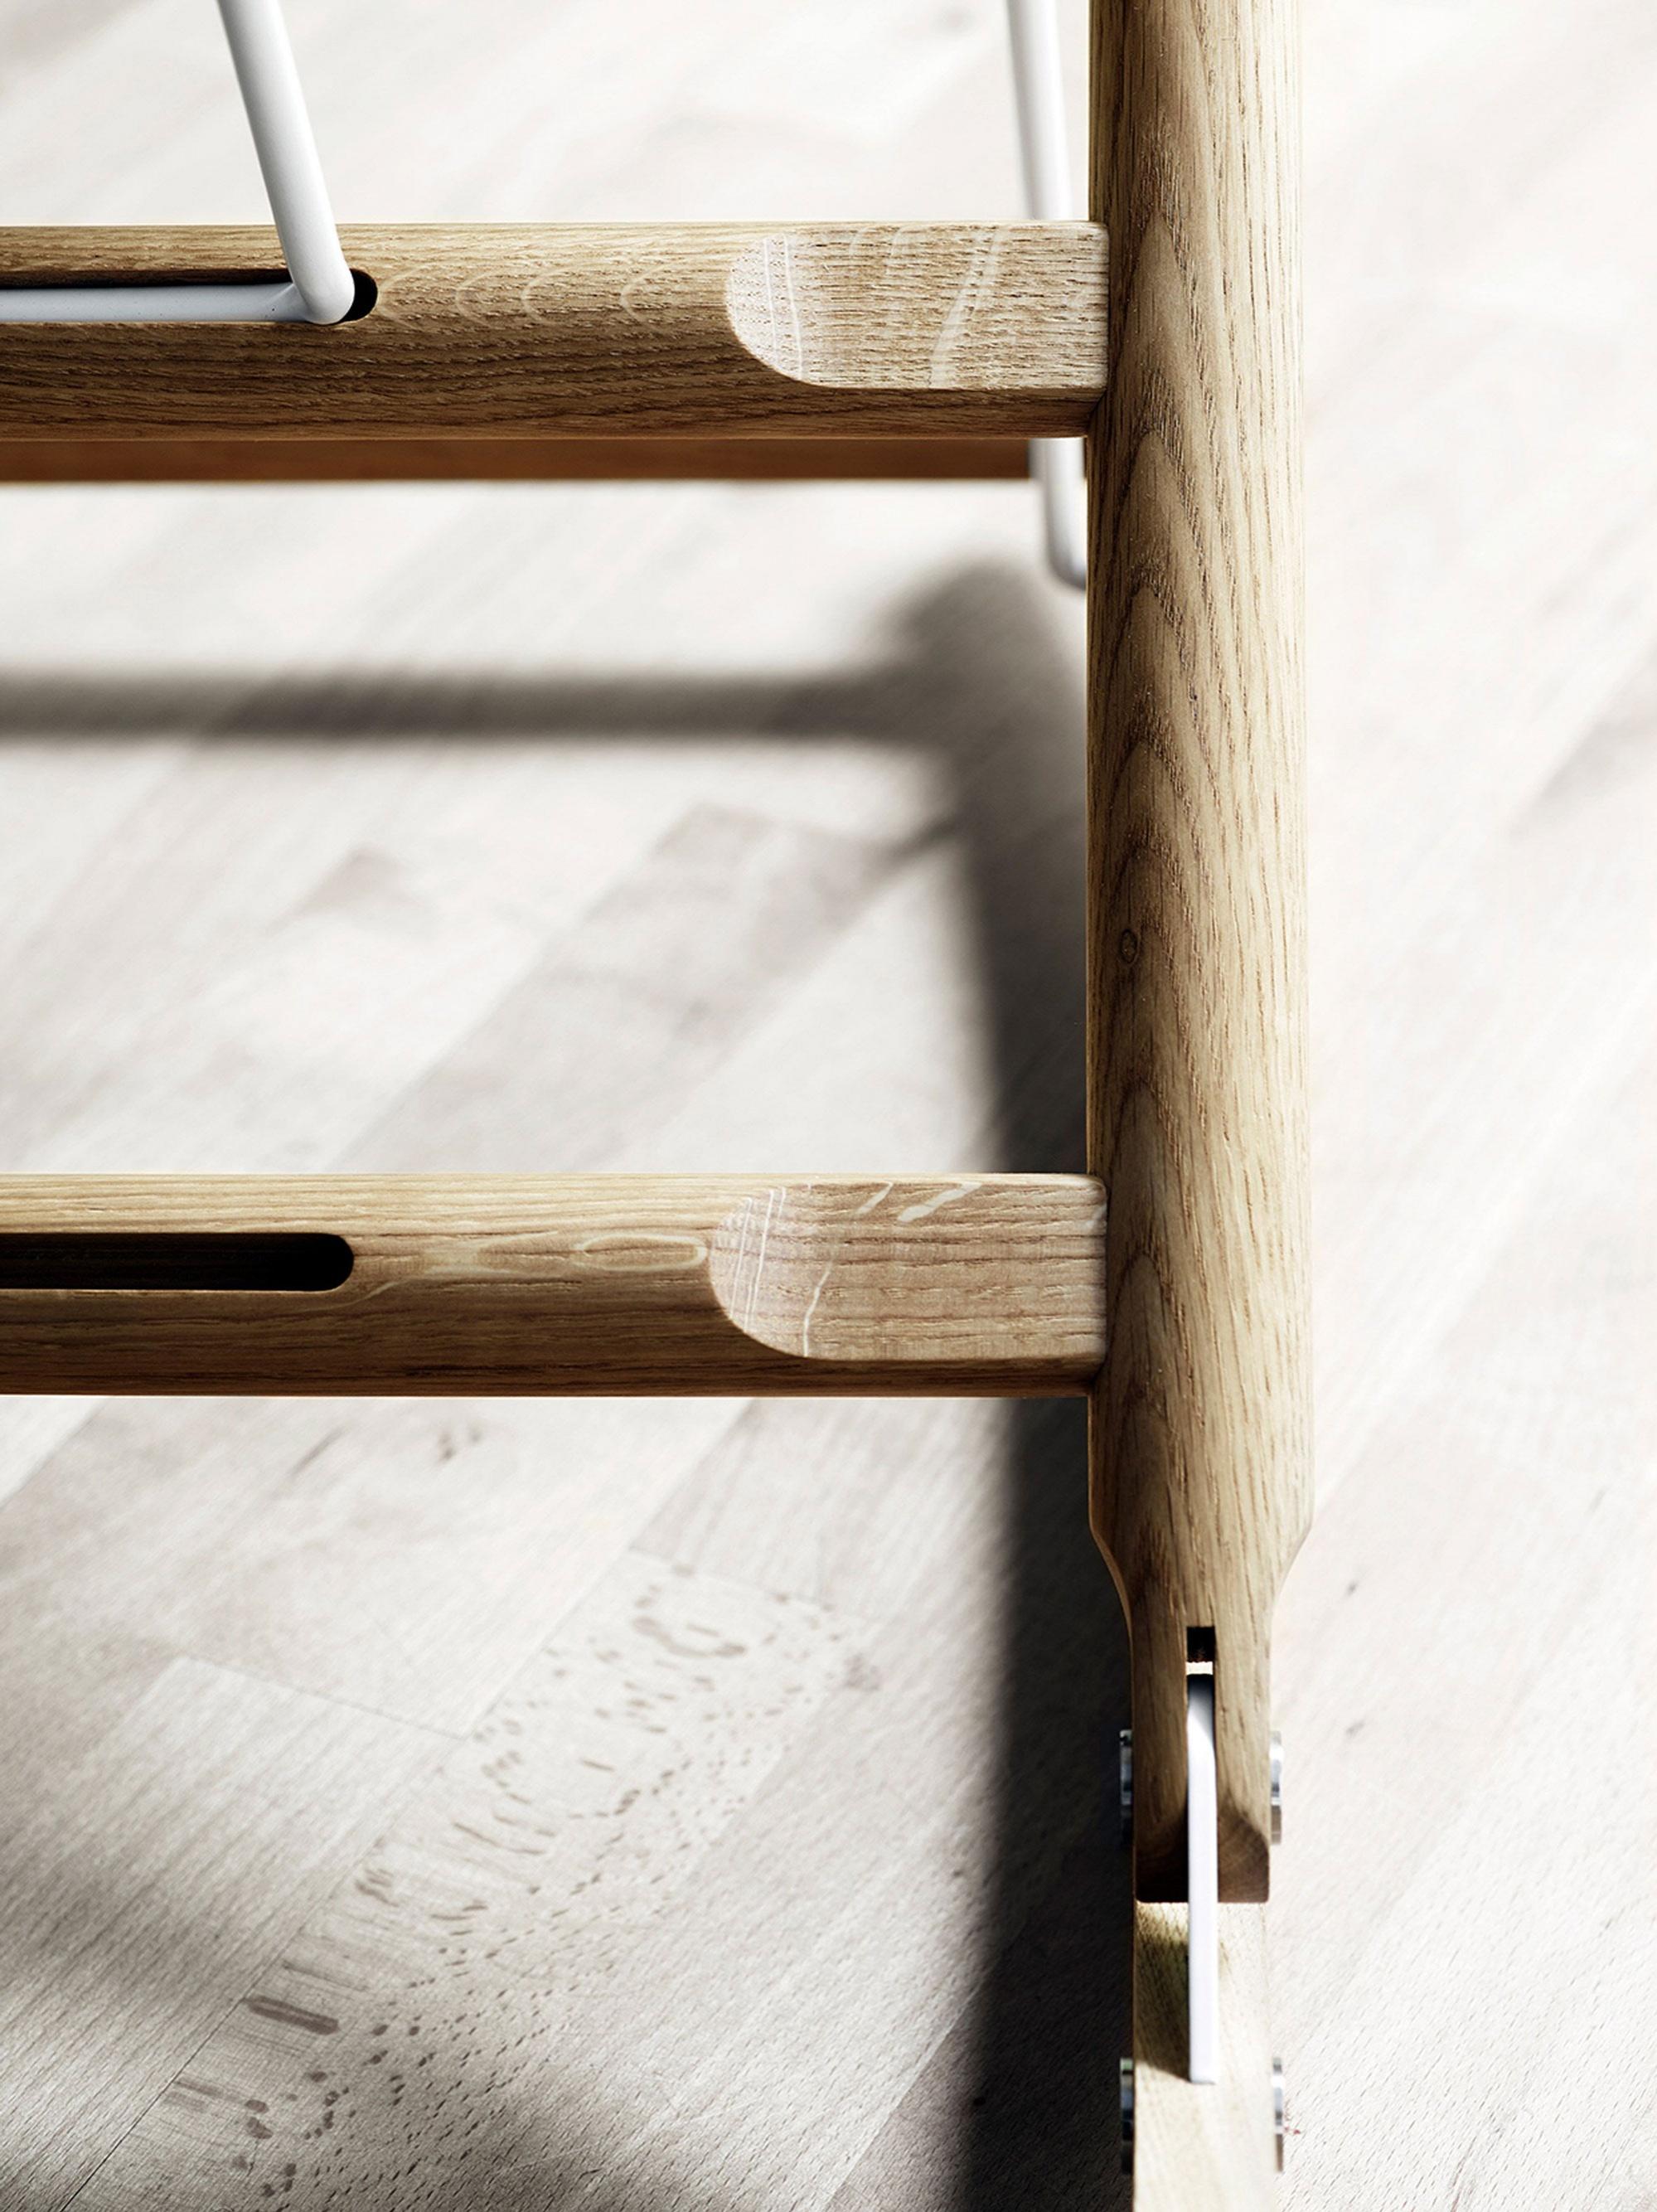 rocking-chair-anker-bak-carl-hansen-gessato-4